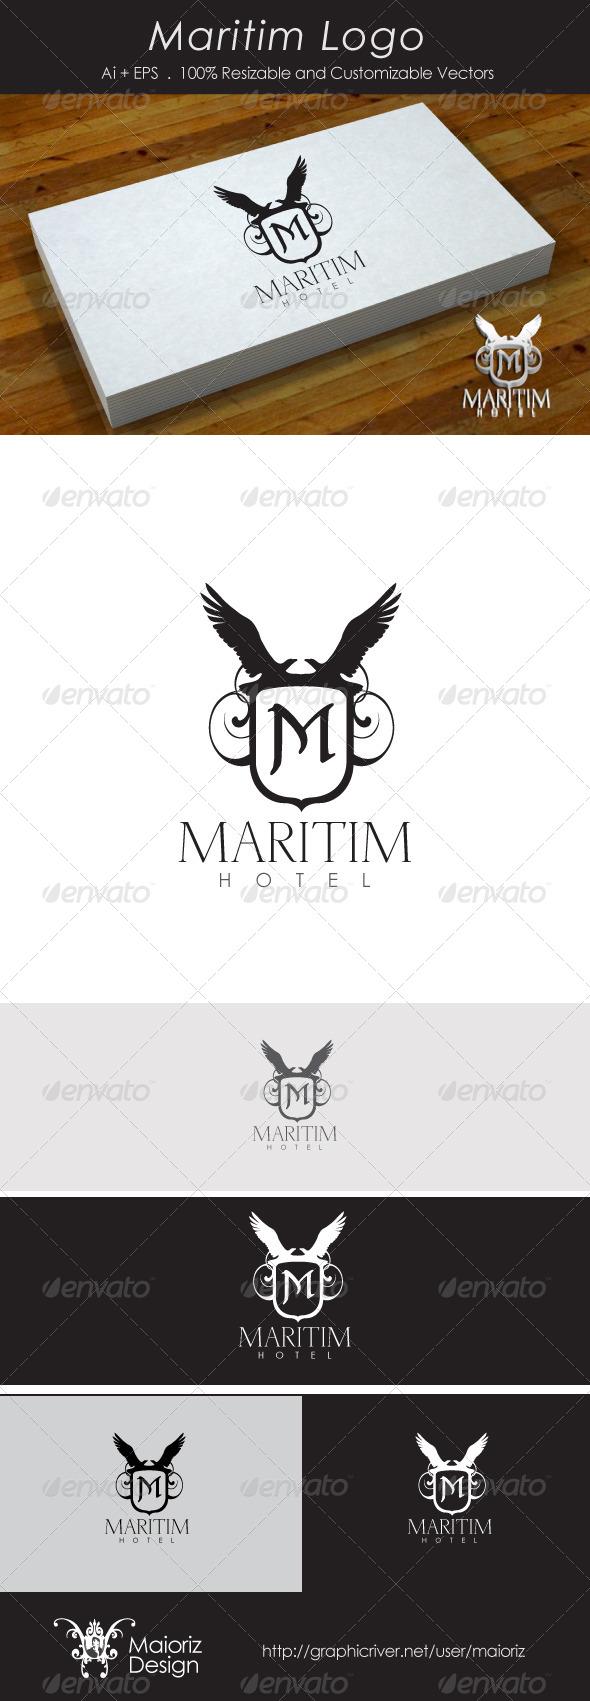 GraphicRiver Maritim Logotype 4065224